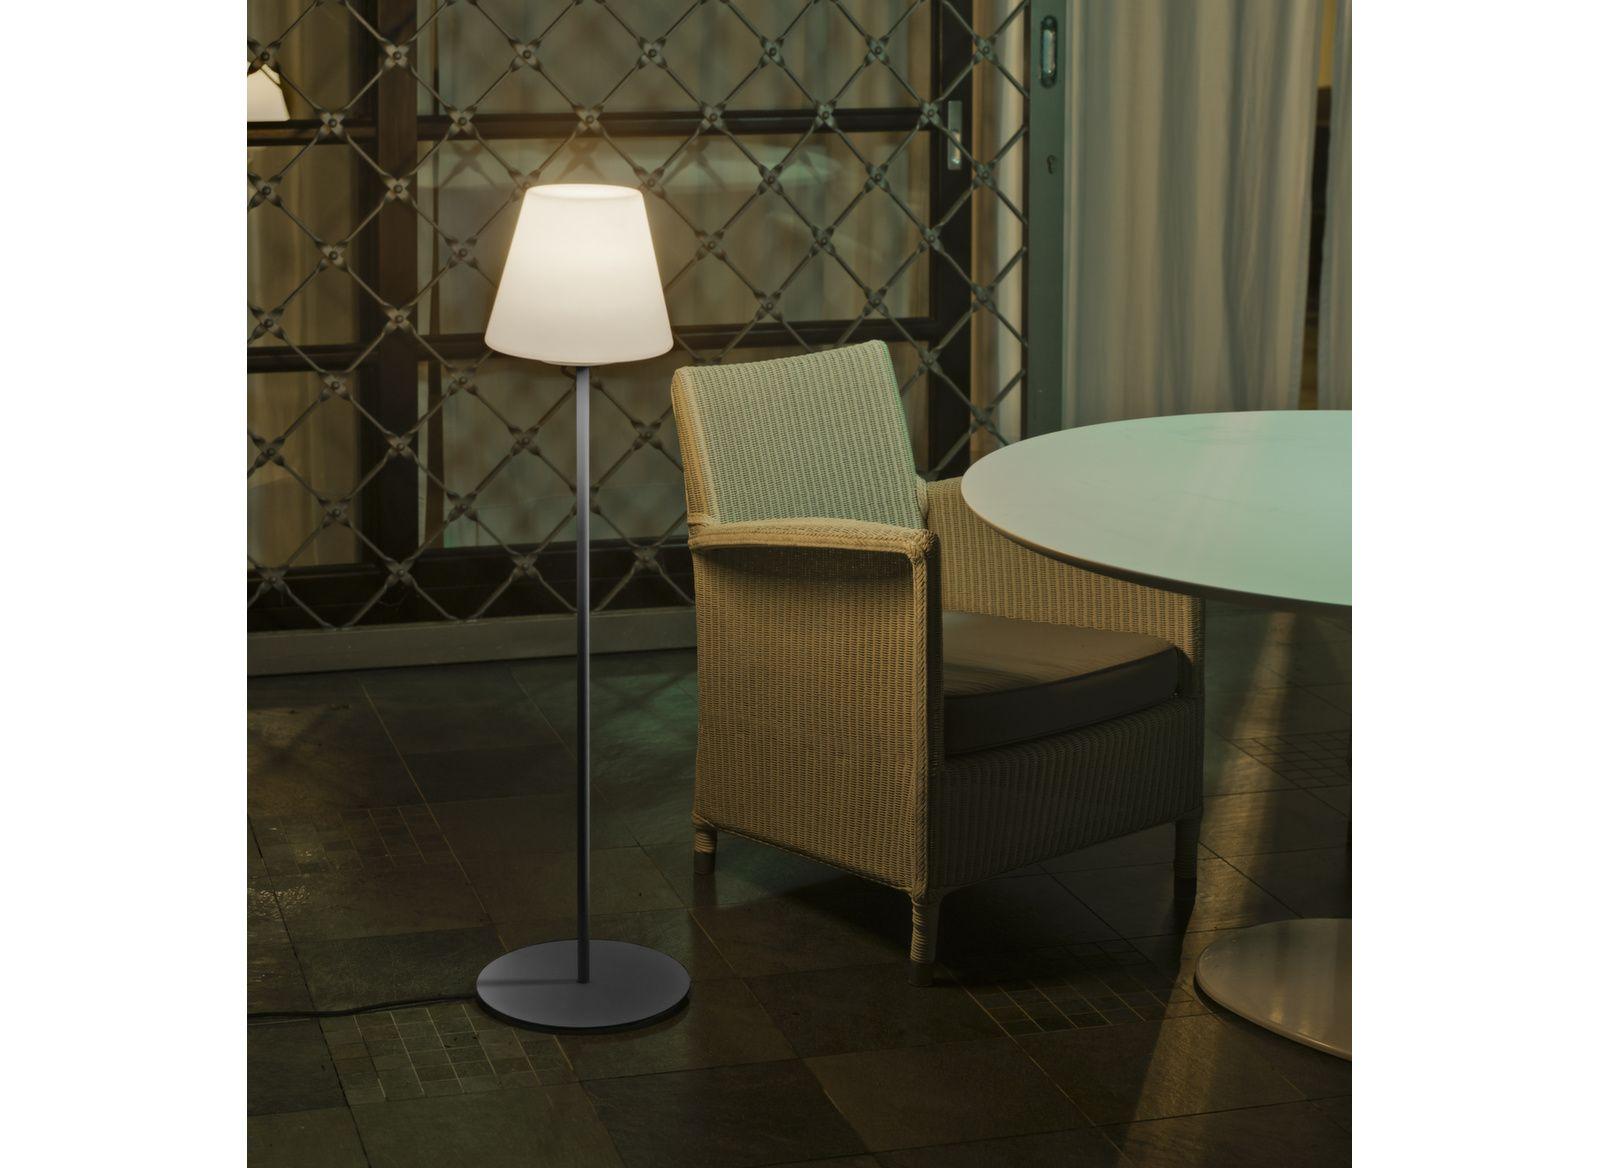 Lampe d'ambiance Lola Slim 120